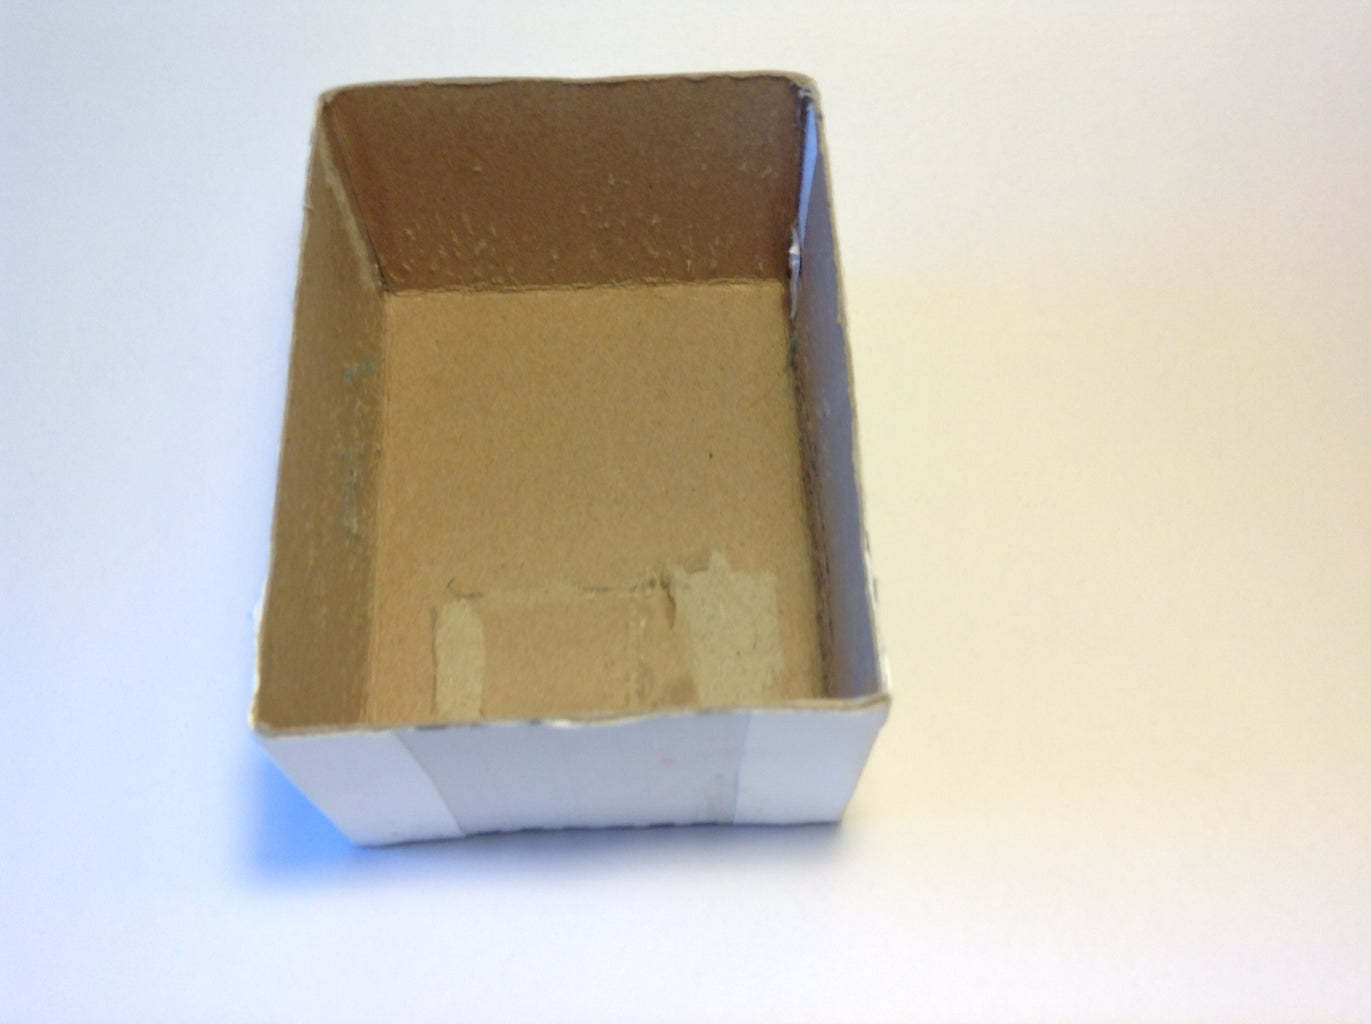 Build the Cardboard Frame